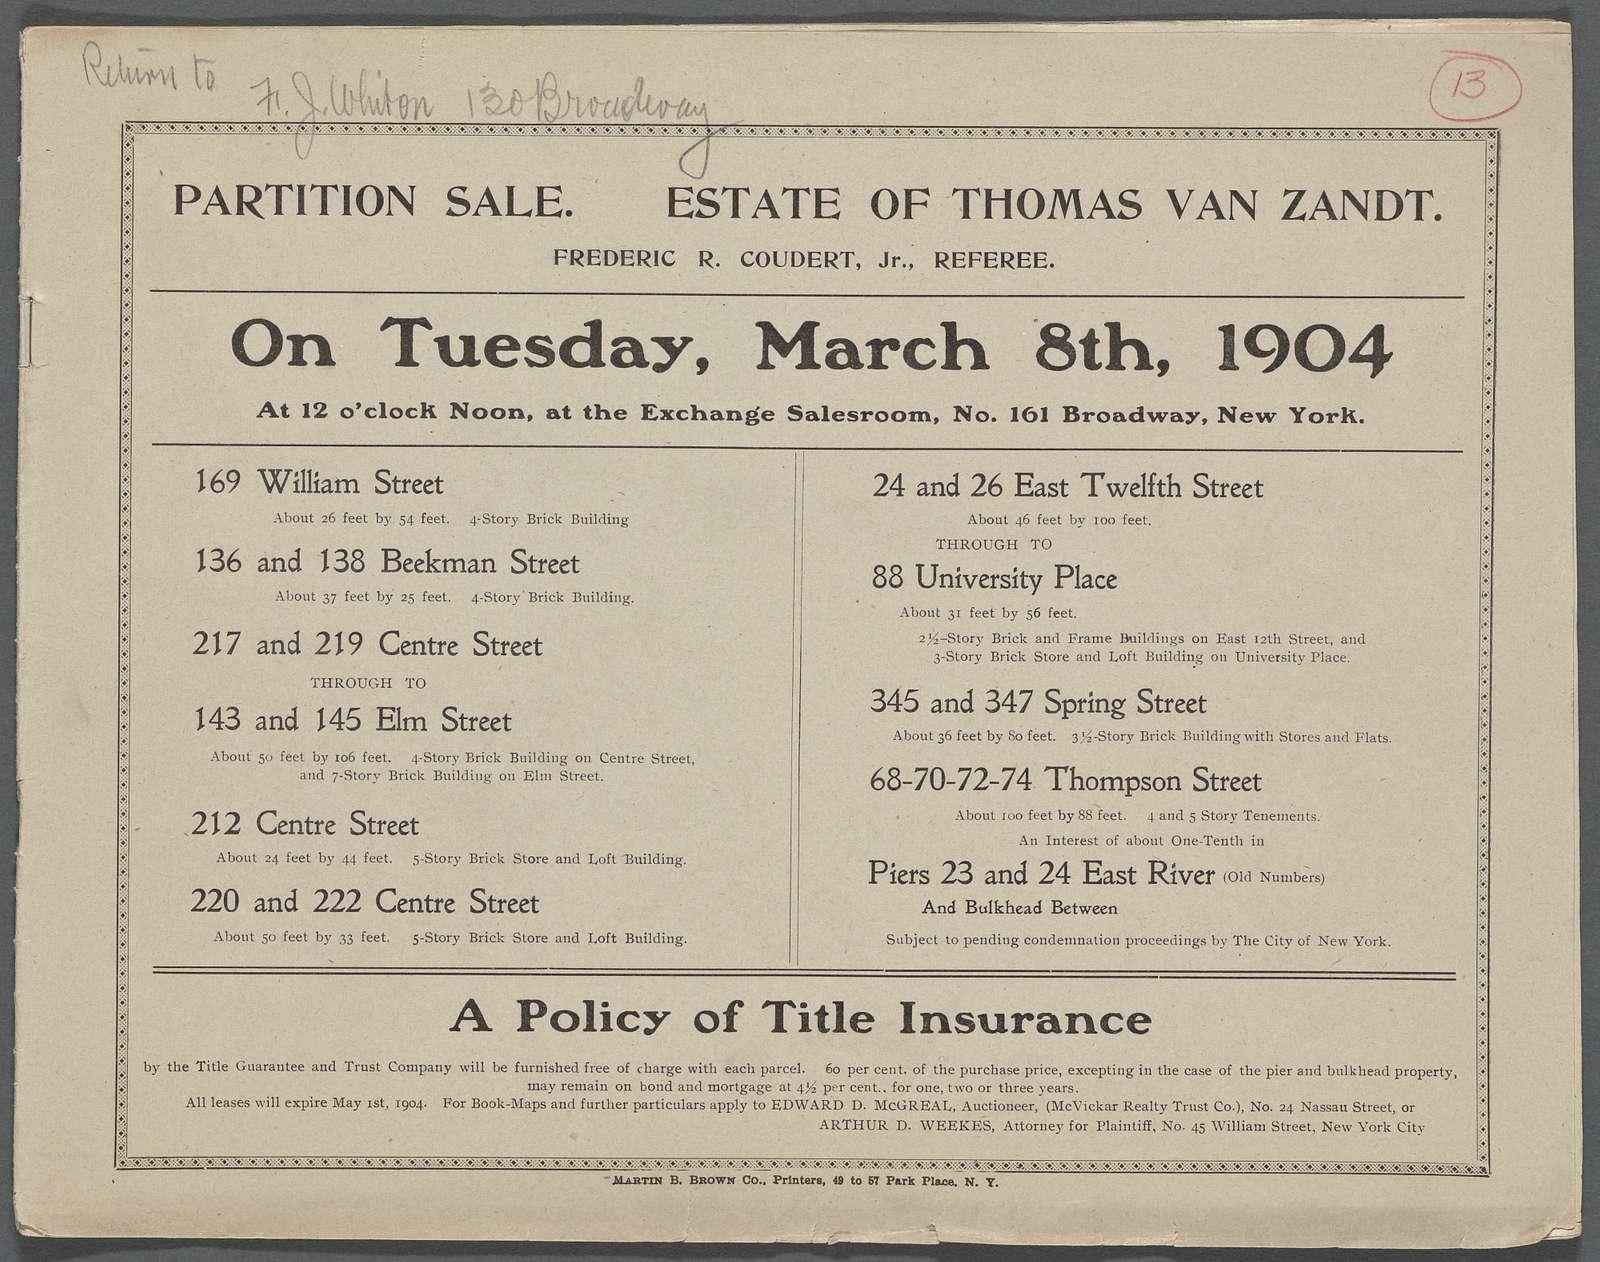 Partition Sale: Estate of Thomas Van Zandt, Frederic R. Coudert, Jr., Referee